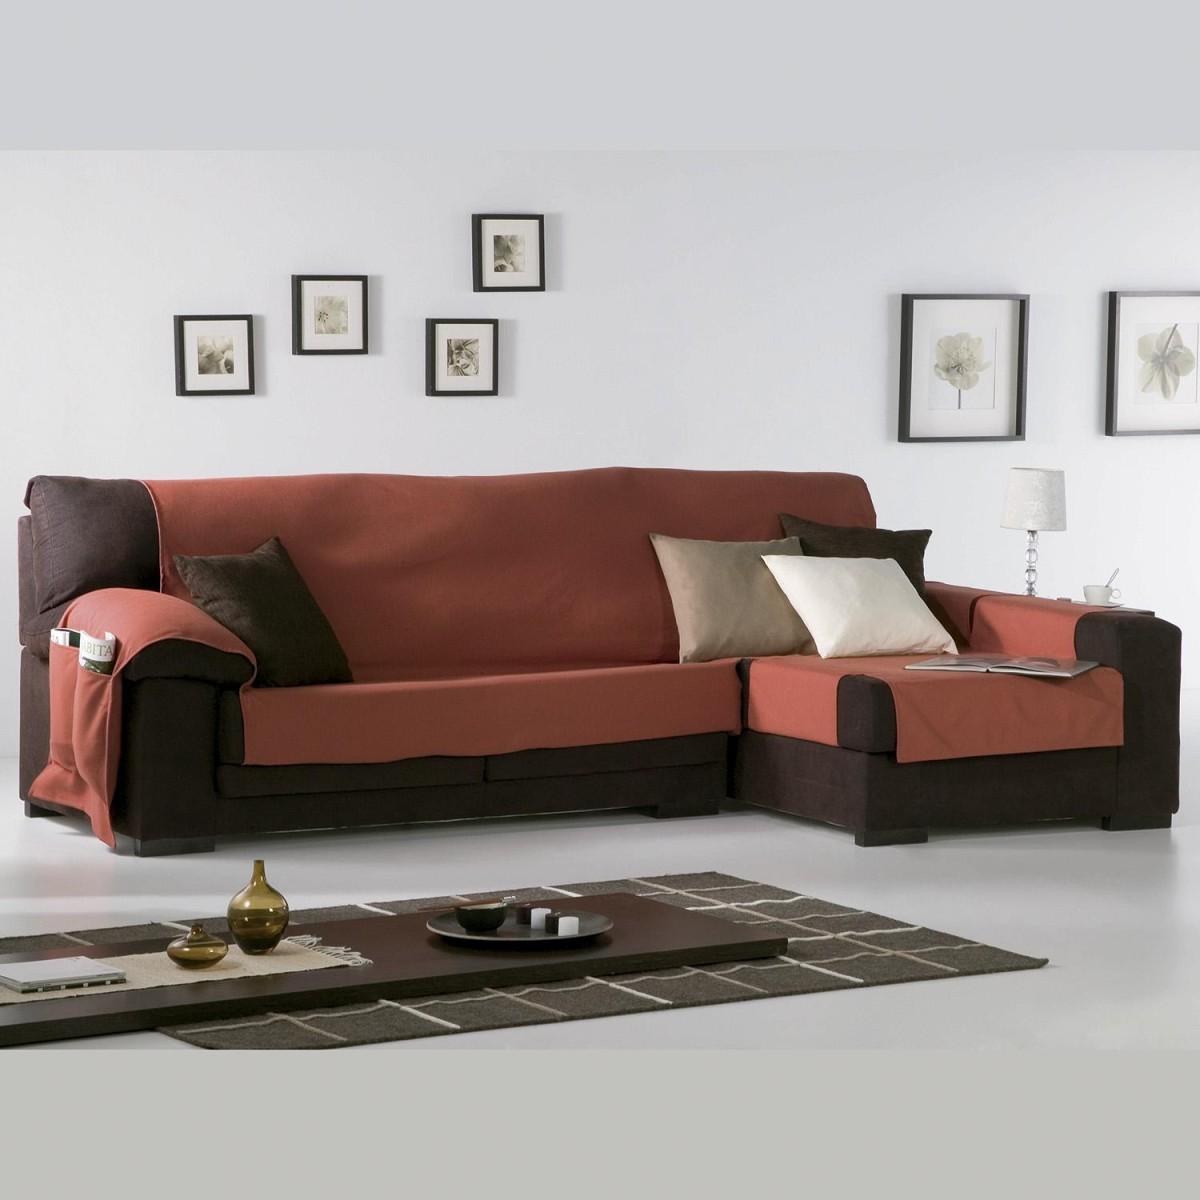 Funda sofá chaise longue LONA LISO Eysa